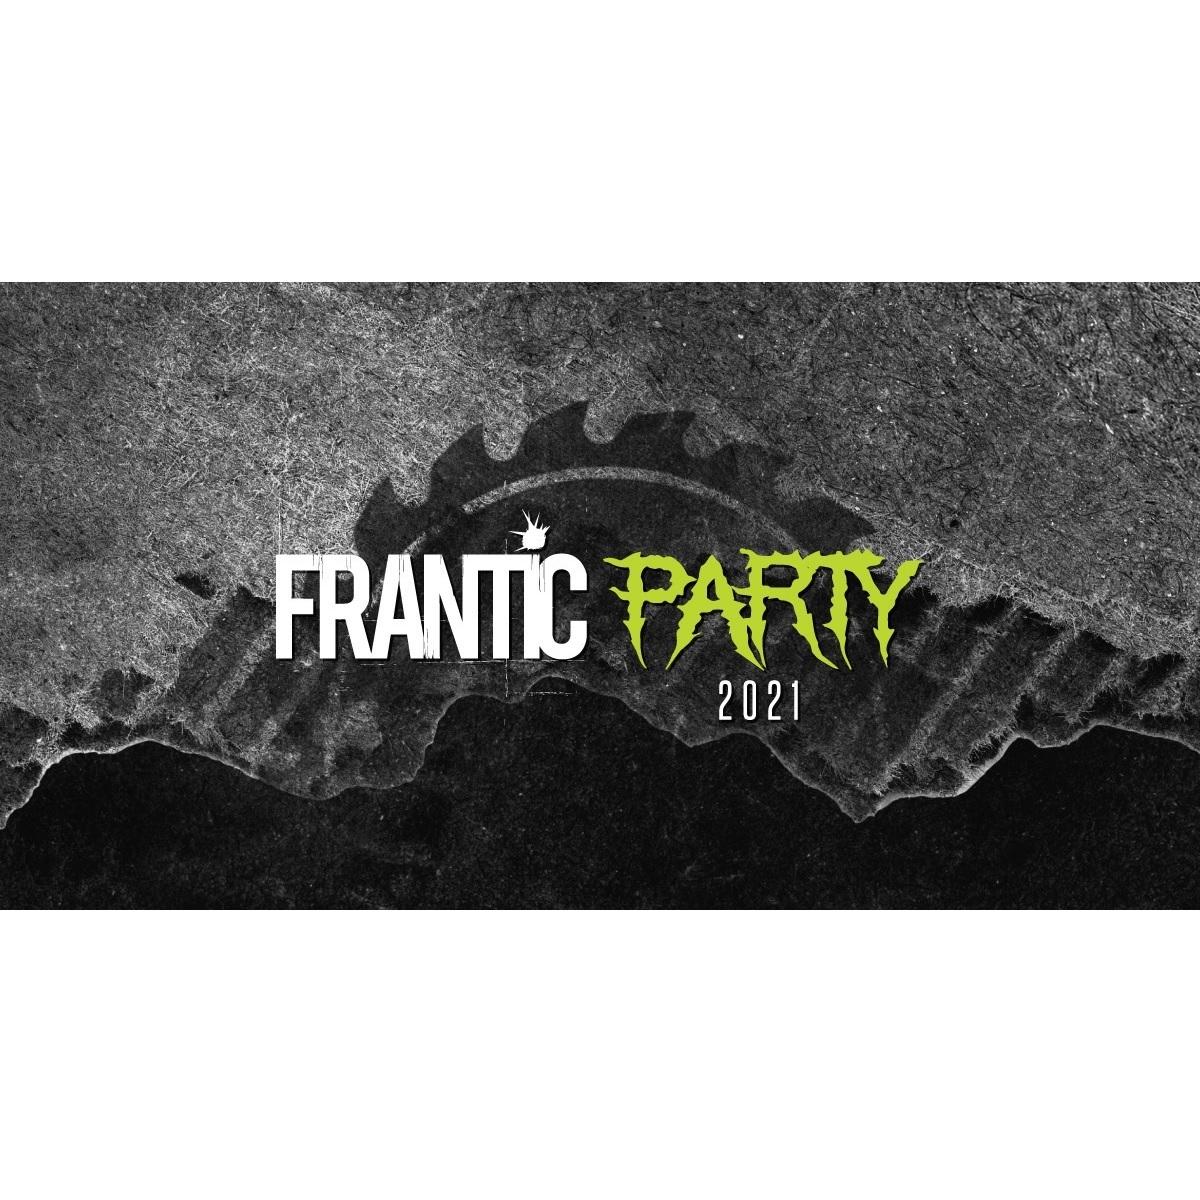 Frantic Party 2021 sabato 21 agosto 2021 foto